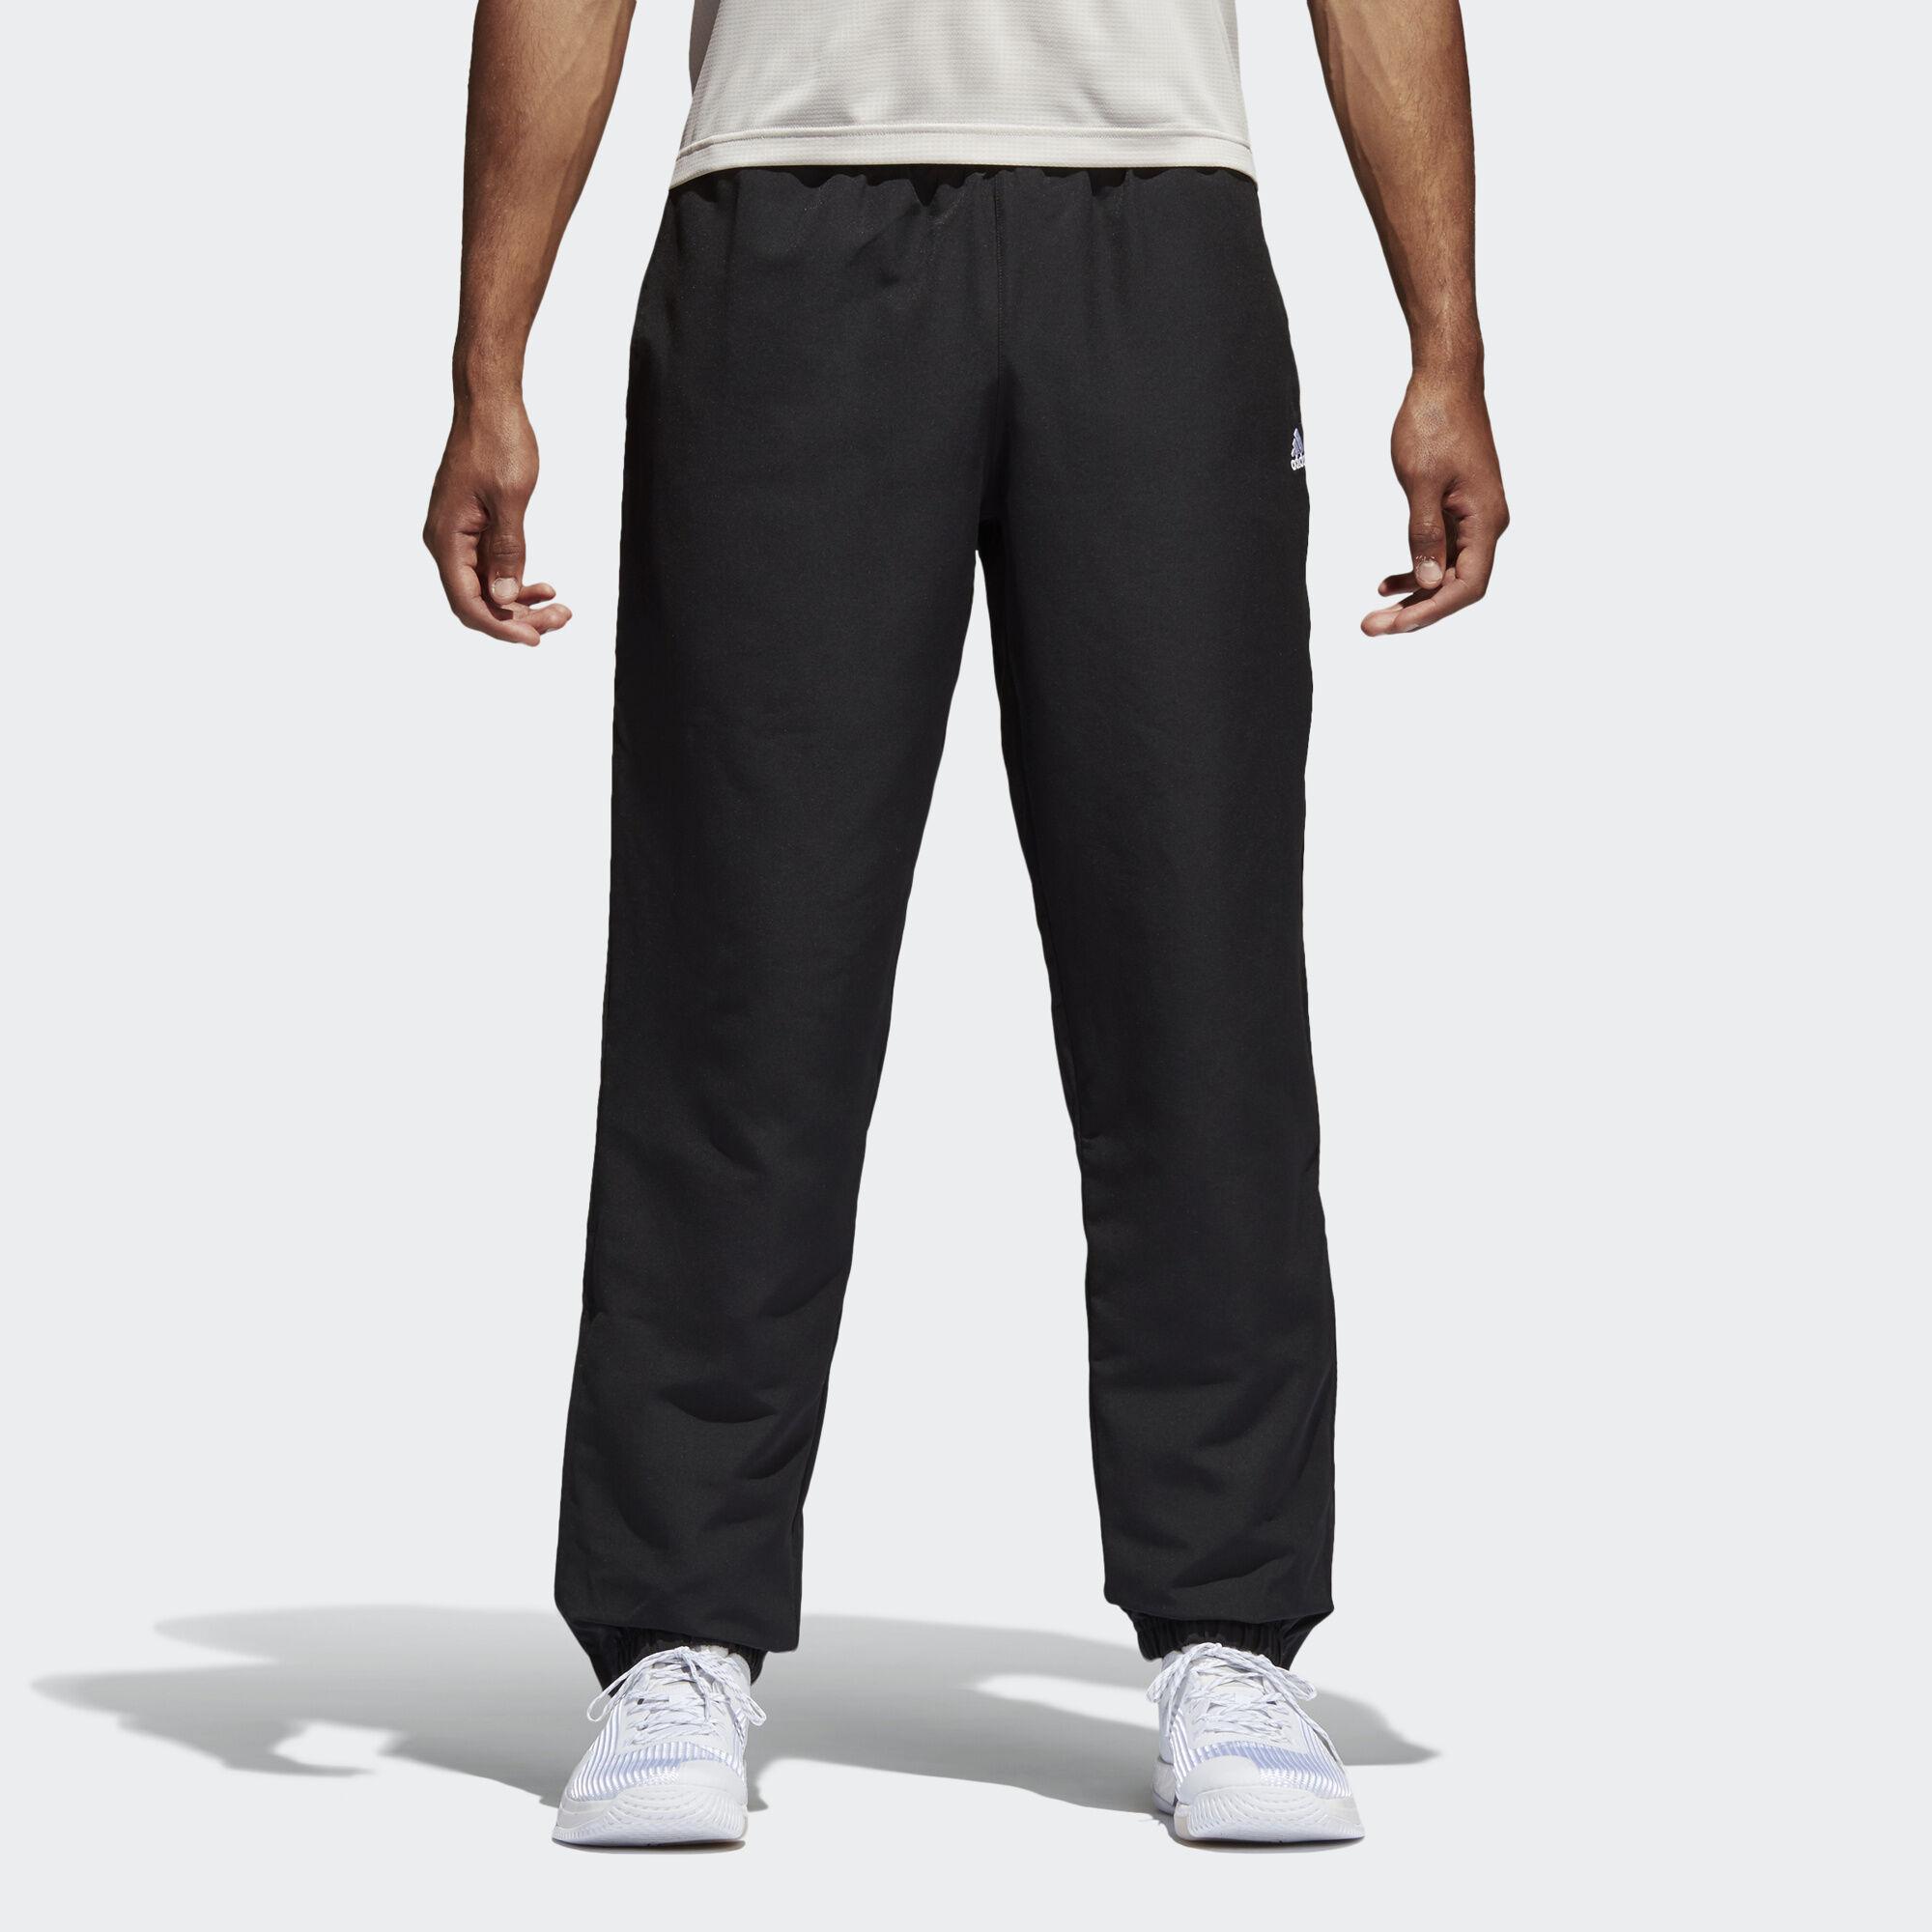 pantalon de sport femme adidas asics marathon de paris. Black Bedroom Furniture Sets. Home Design Ideas